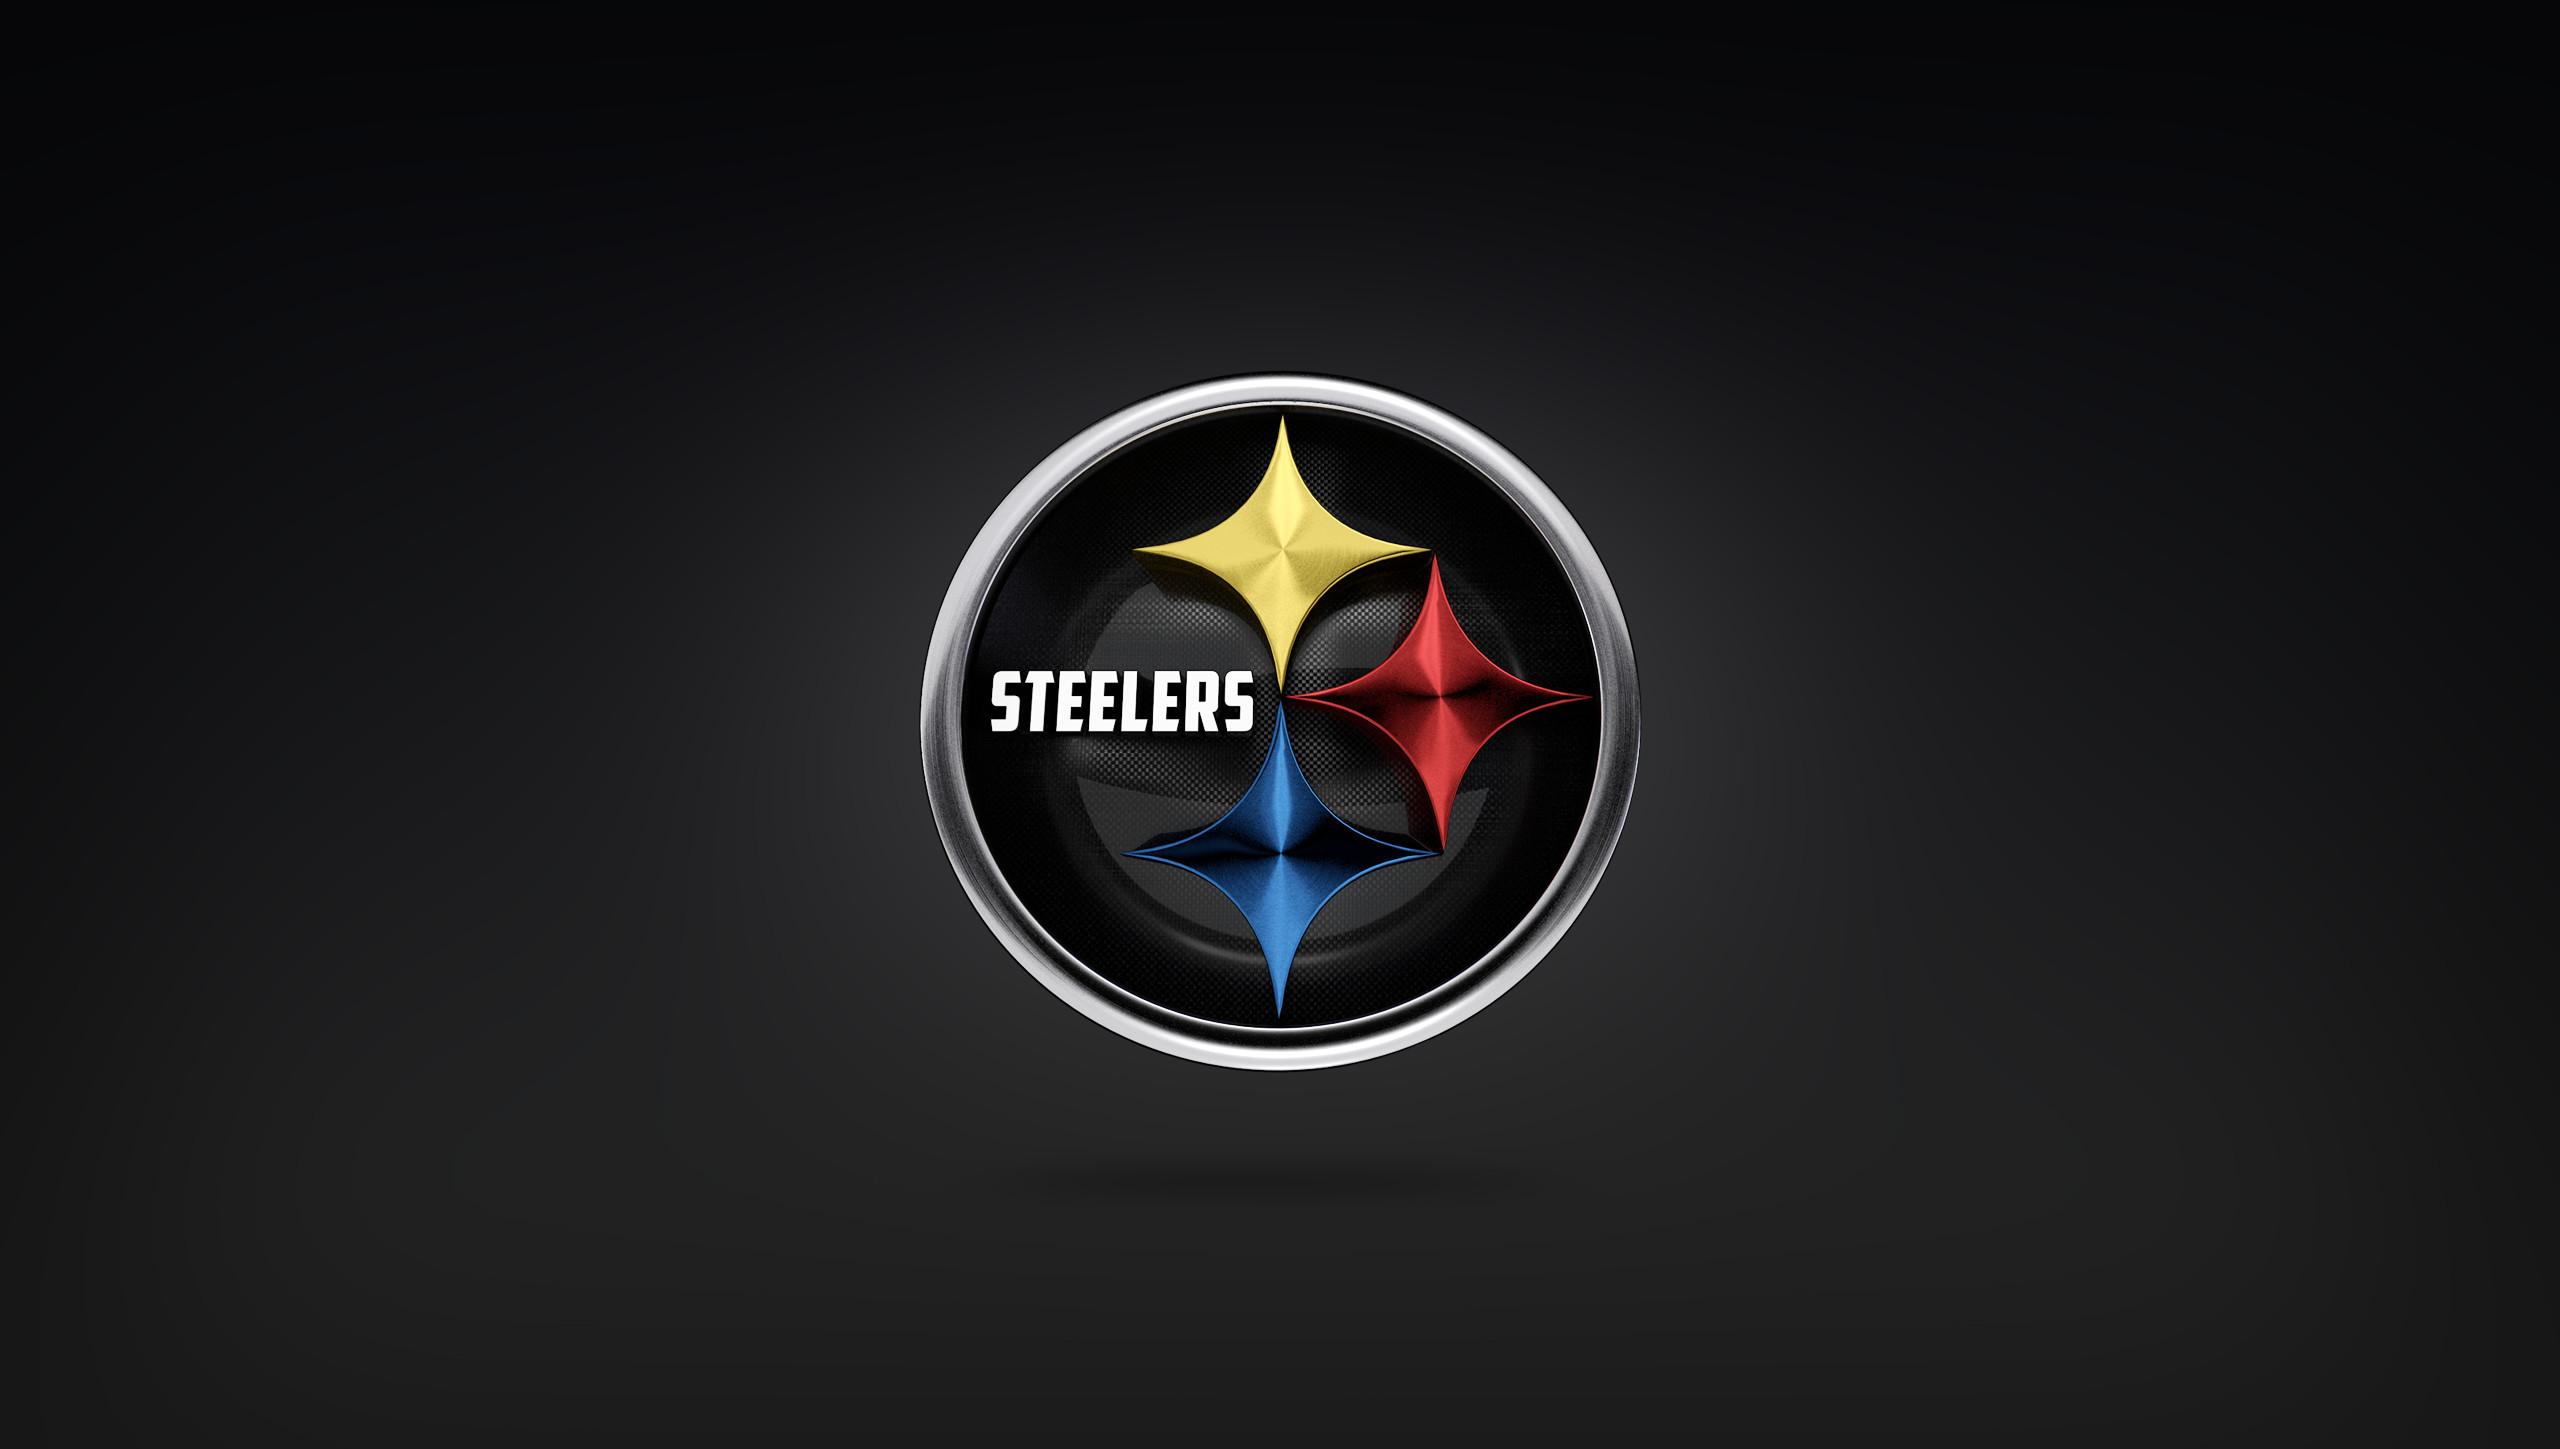 Res: 2560x1449, steelers wallpaper Sports team logos wallpapers Toni Pihlaja